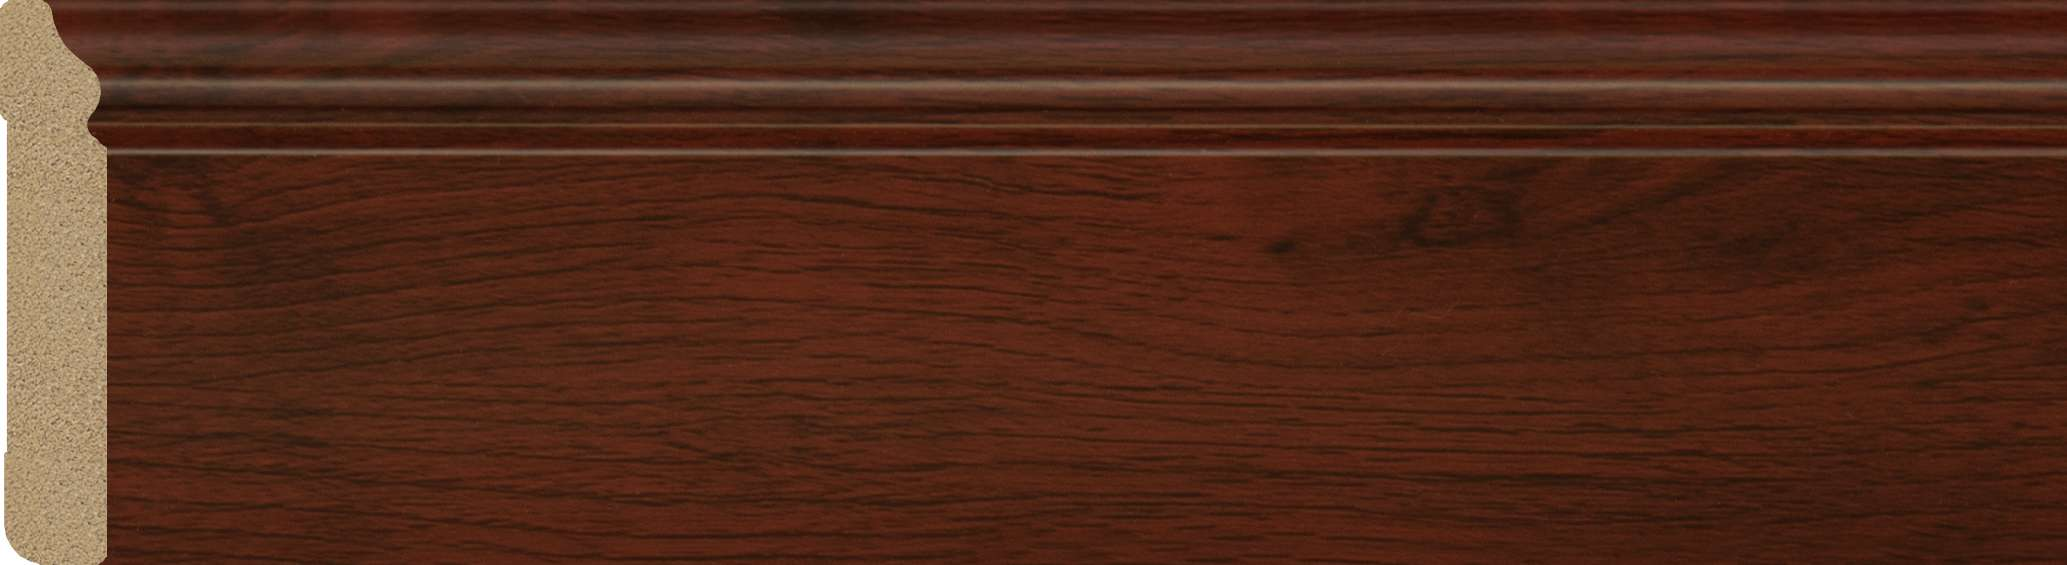 walnut skirting board